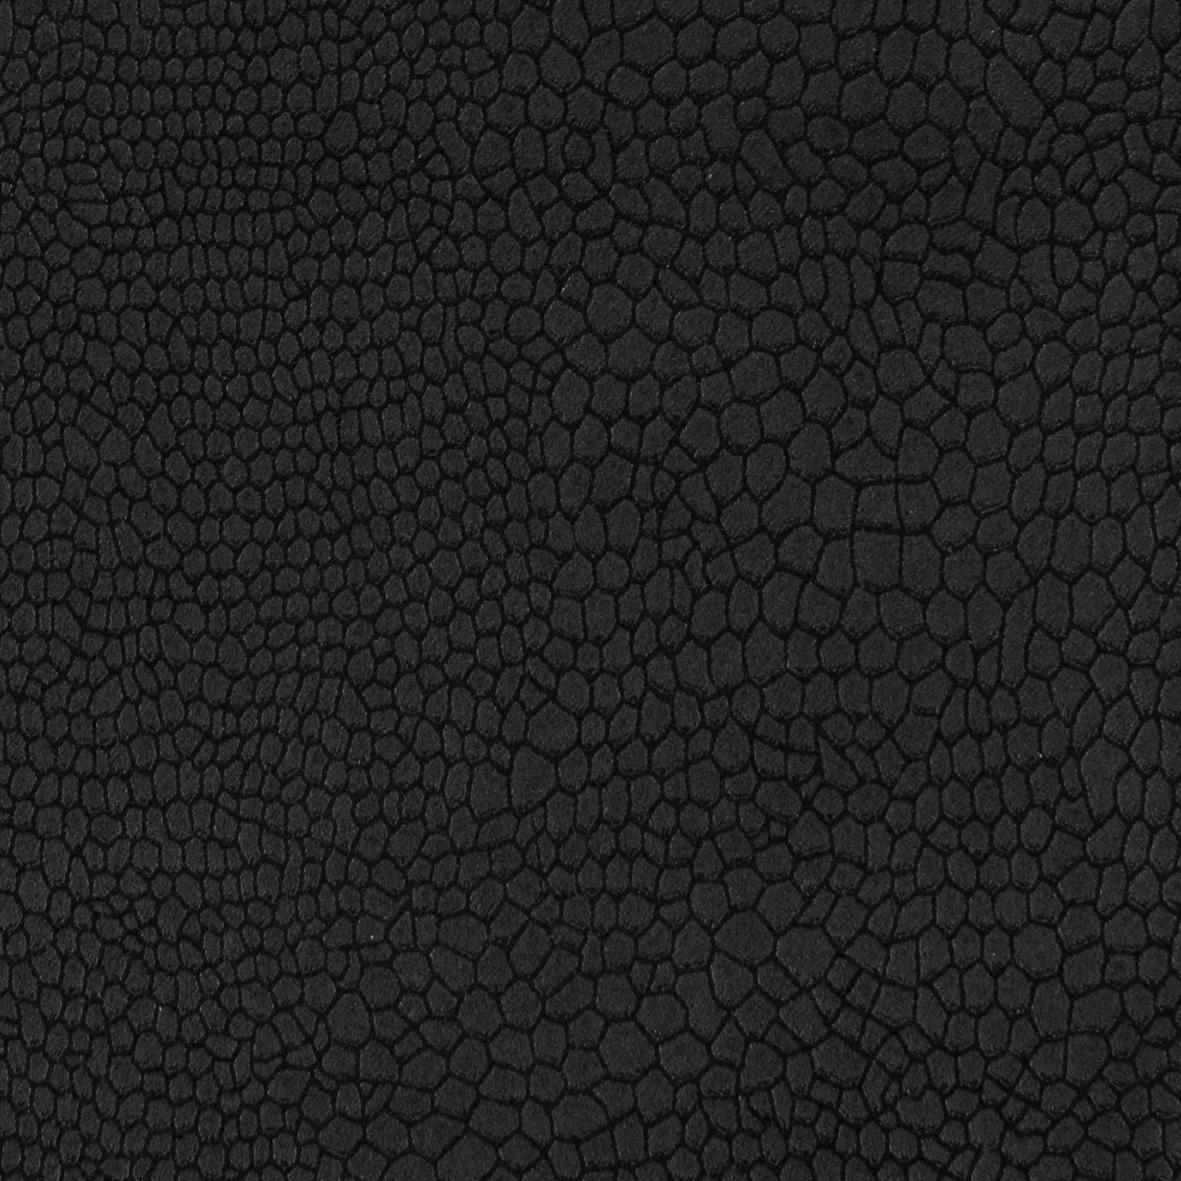 550-fanual-blacklowres_1